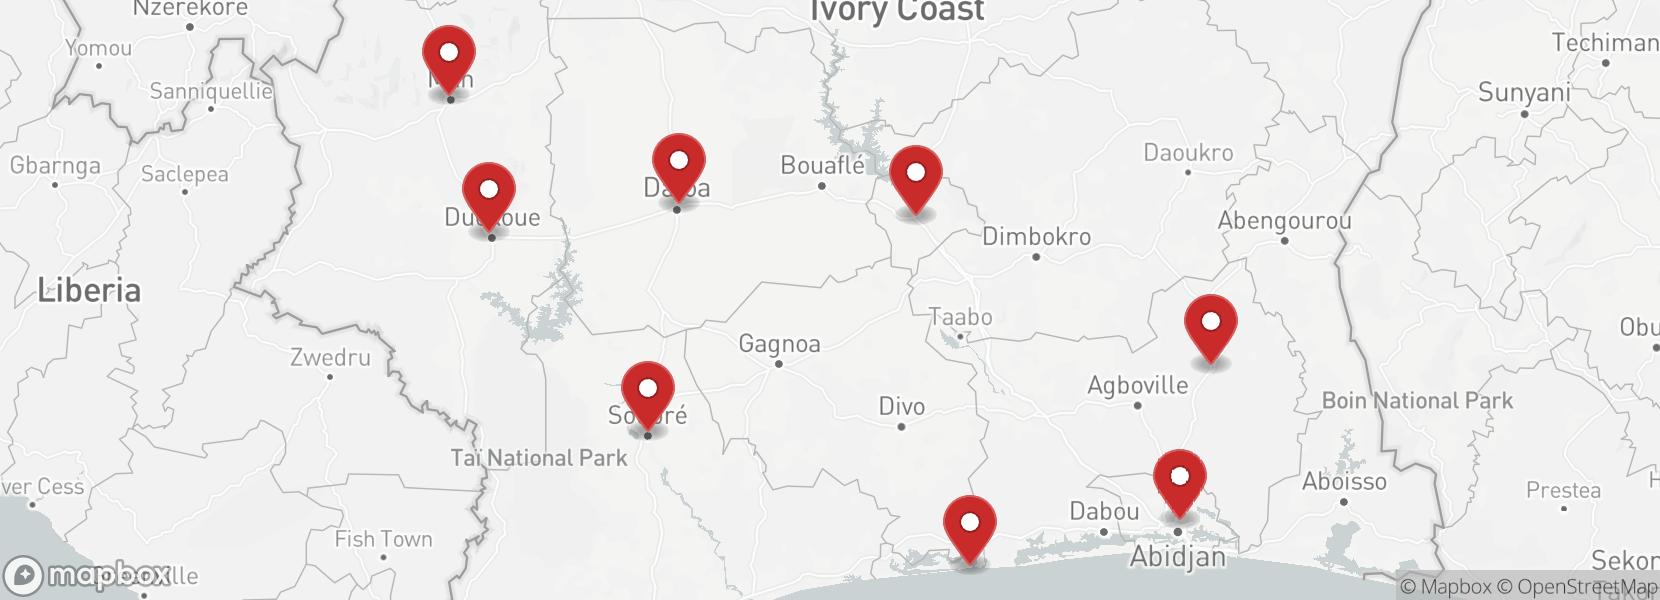 itinerari Motorcycle tour Ivory Coast Enduro